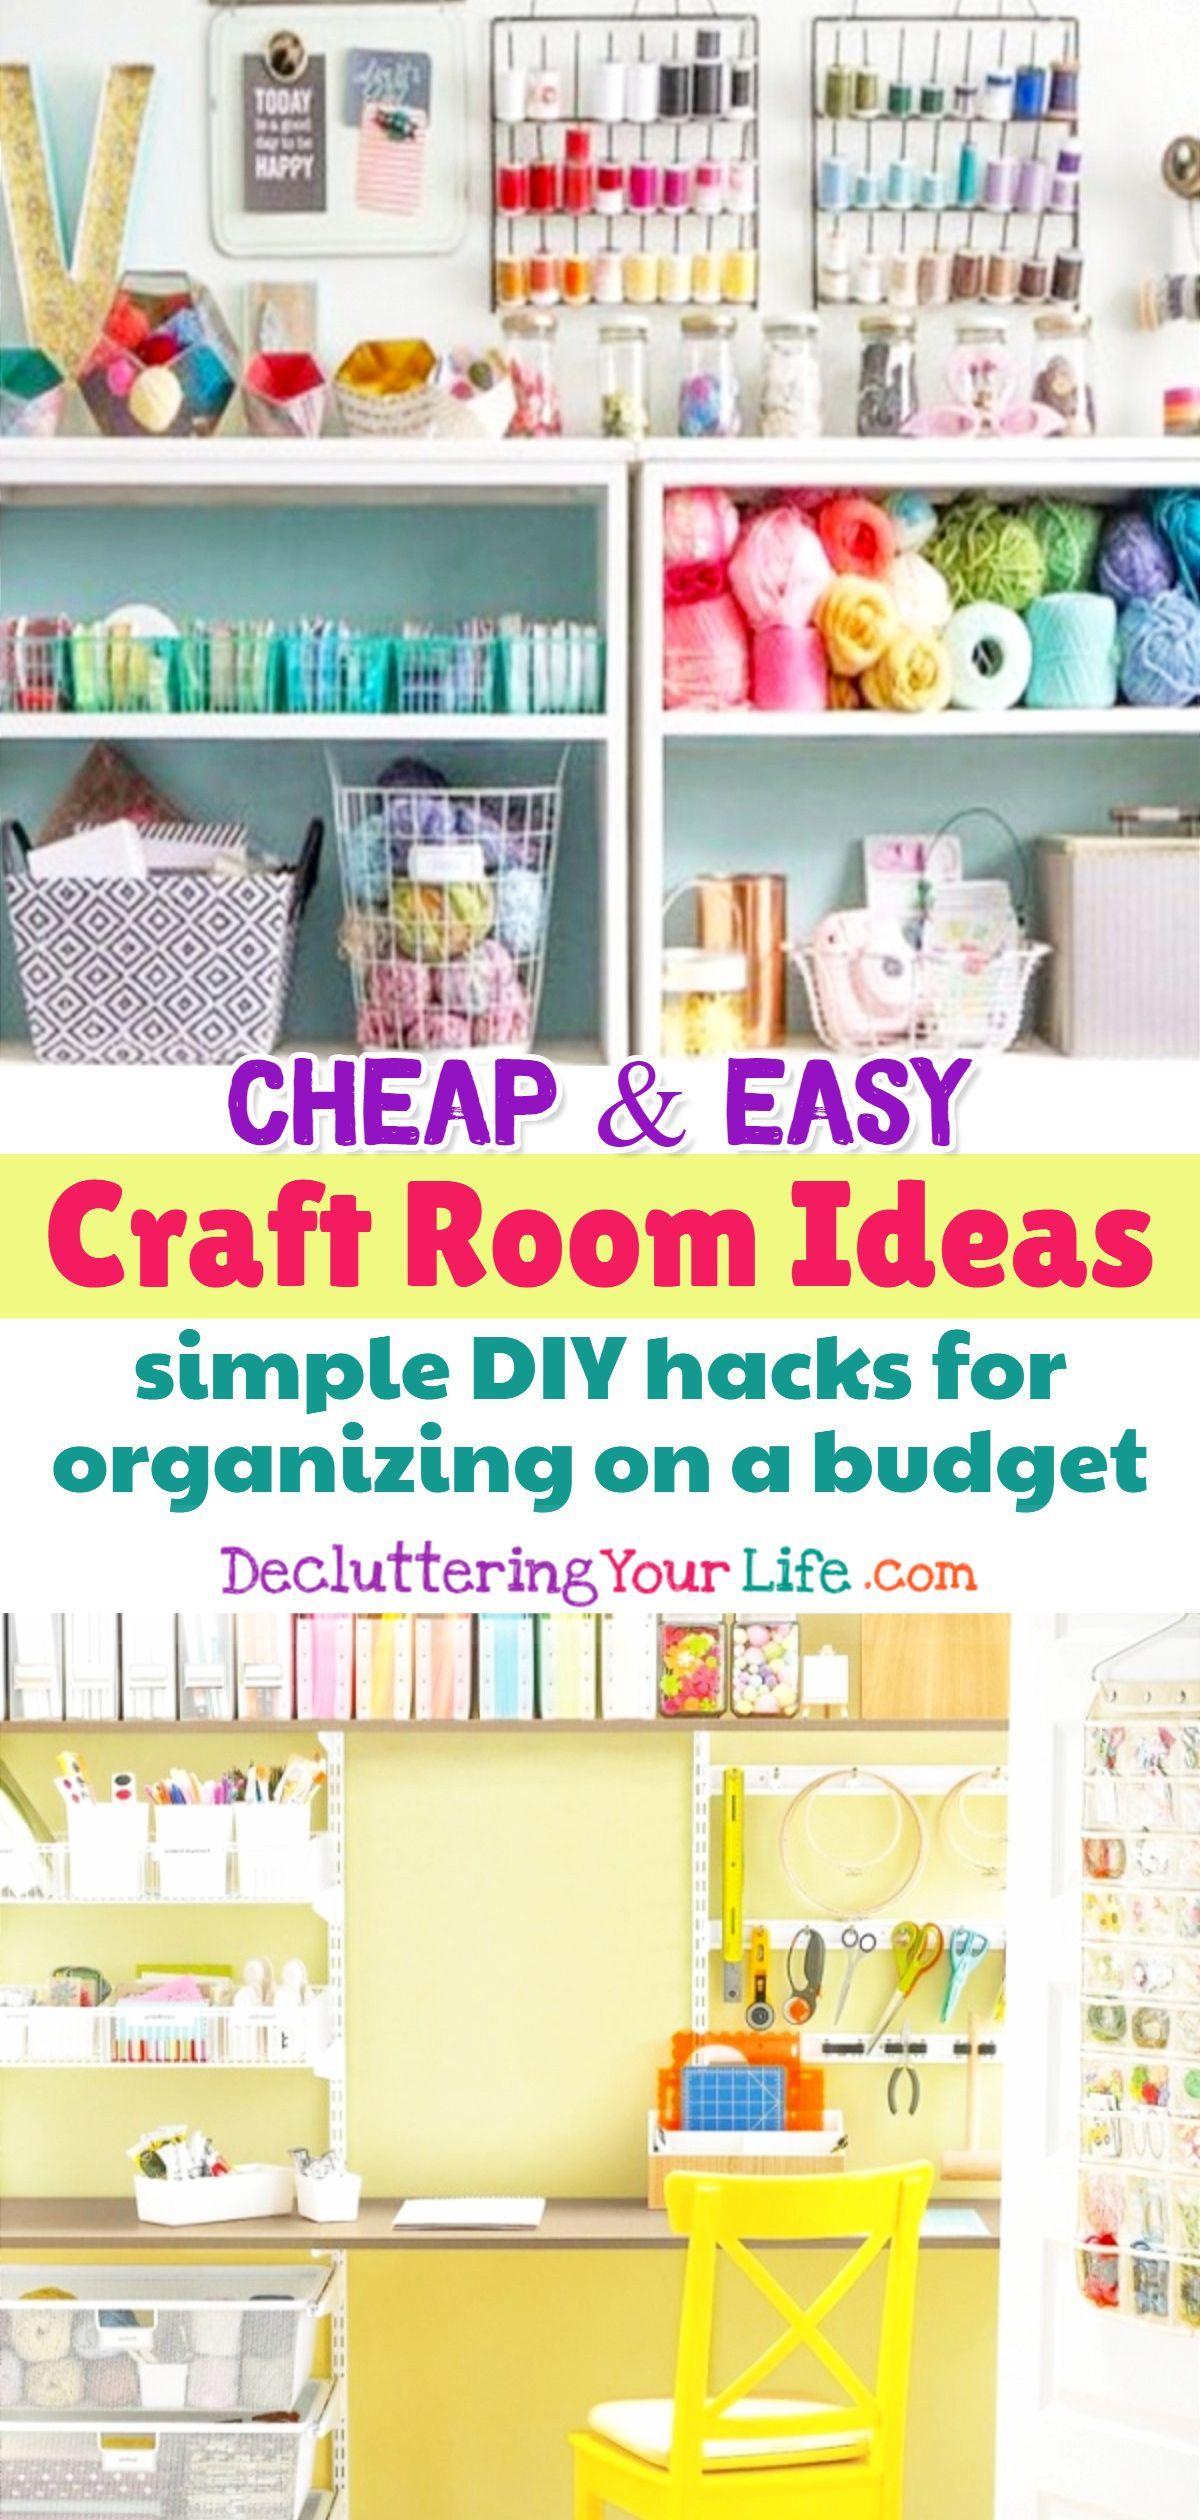 Craft Room Ideas Organizing On A Budget Diy Craft Room Ideas For